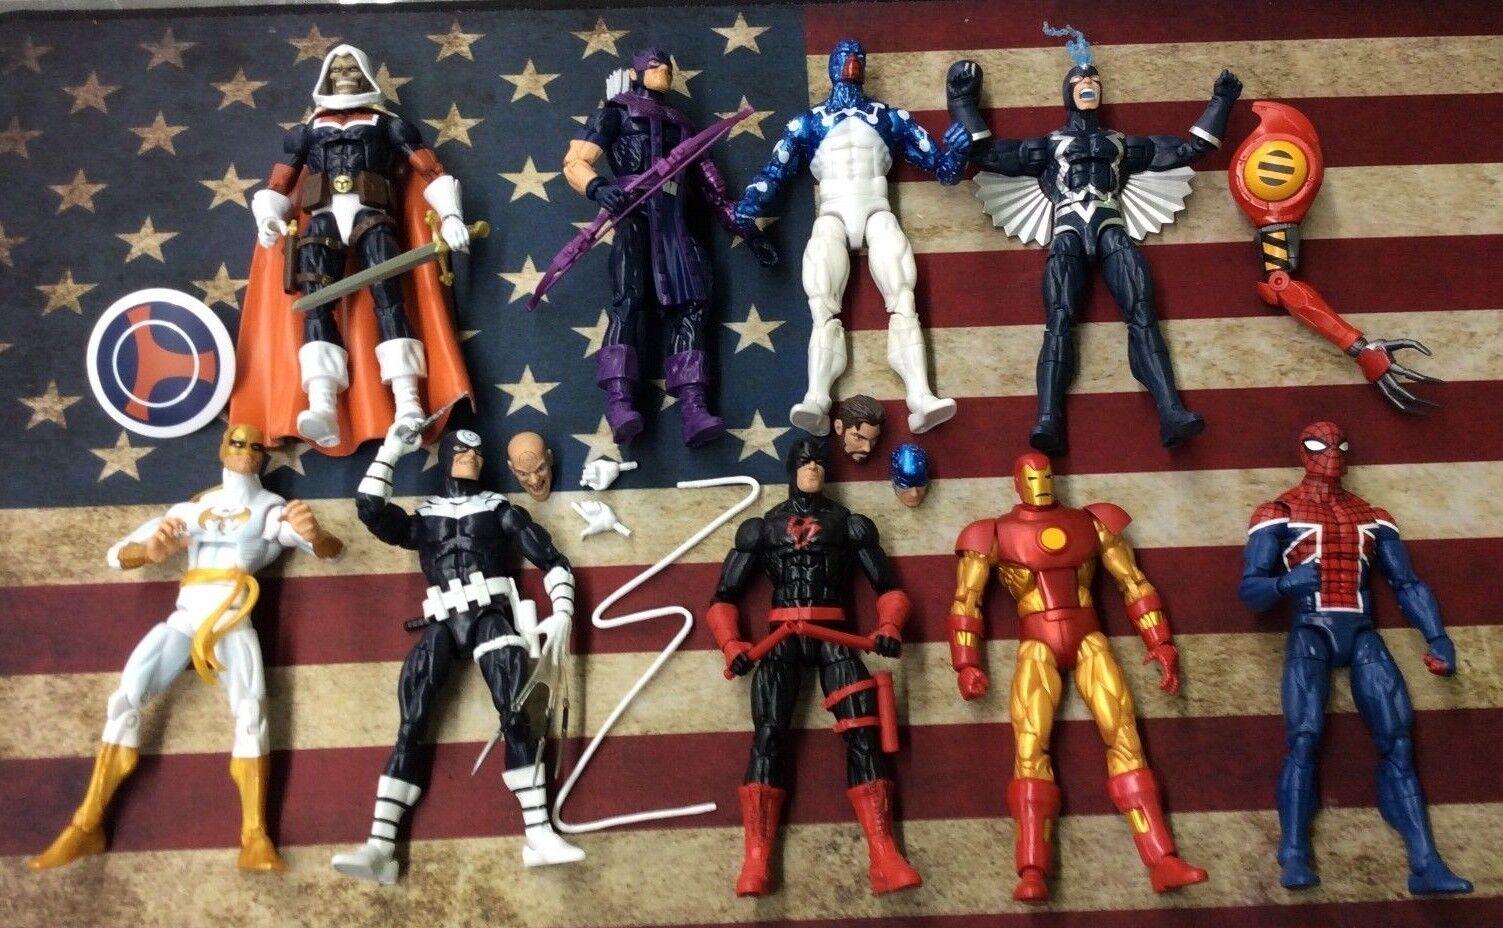 Hasbro Marvel Legends Action Figures Lot  Daredevil Spiderman & More  Pics